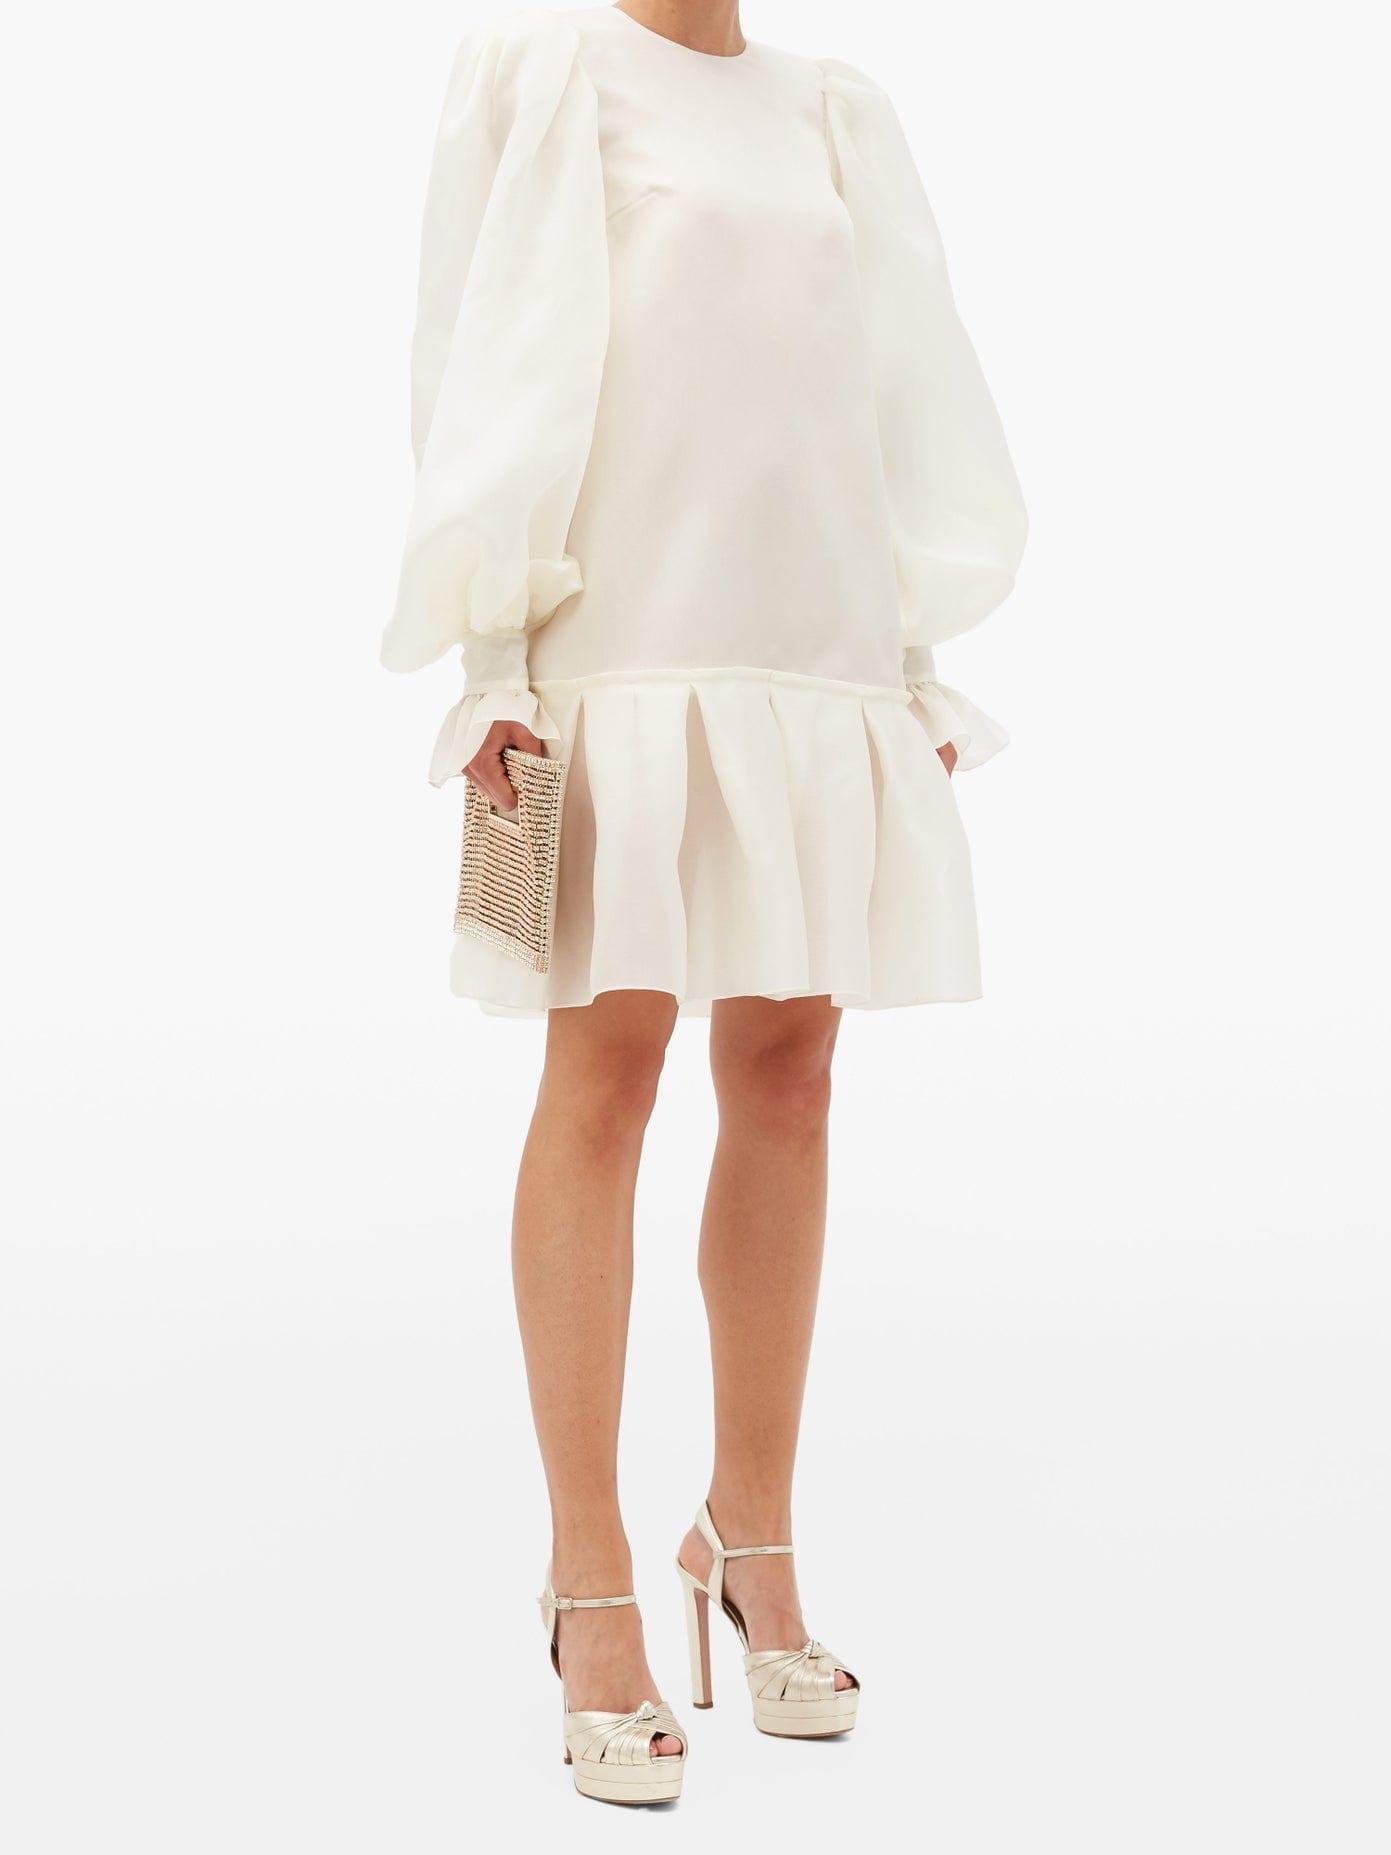 GILES Kristen Balloon-sleeved Silk-organza Mini Dress